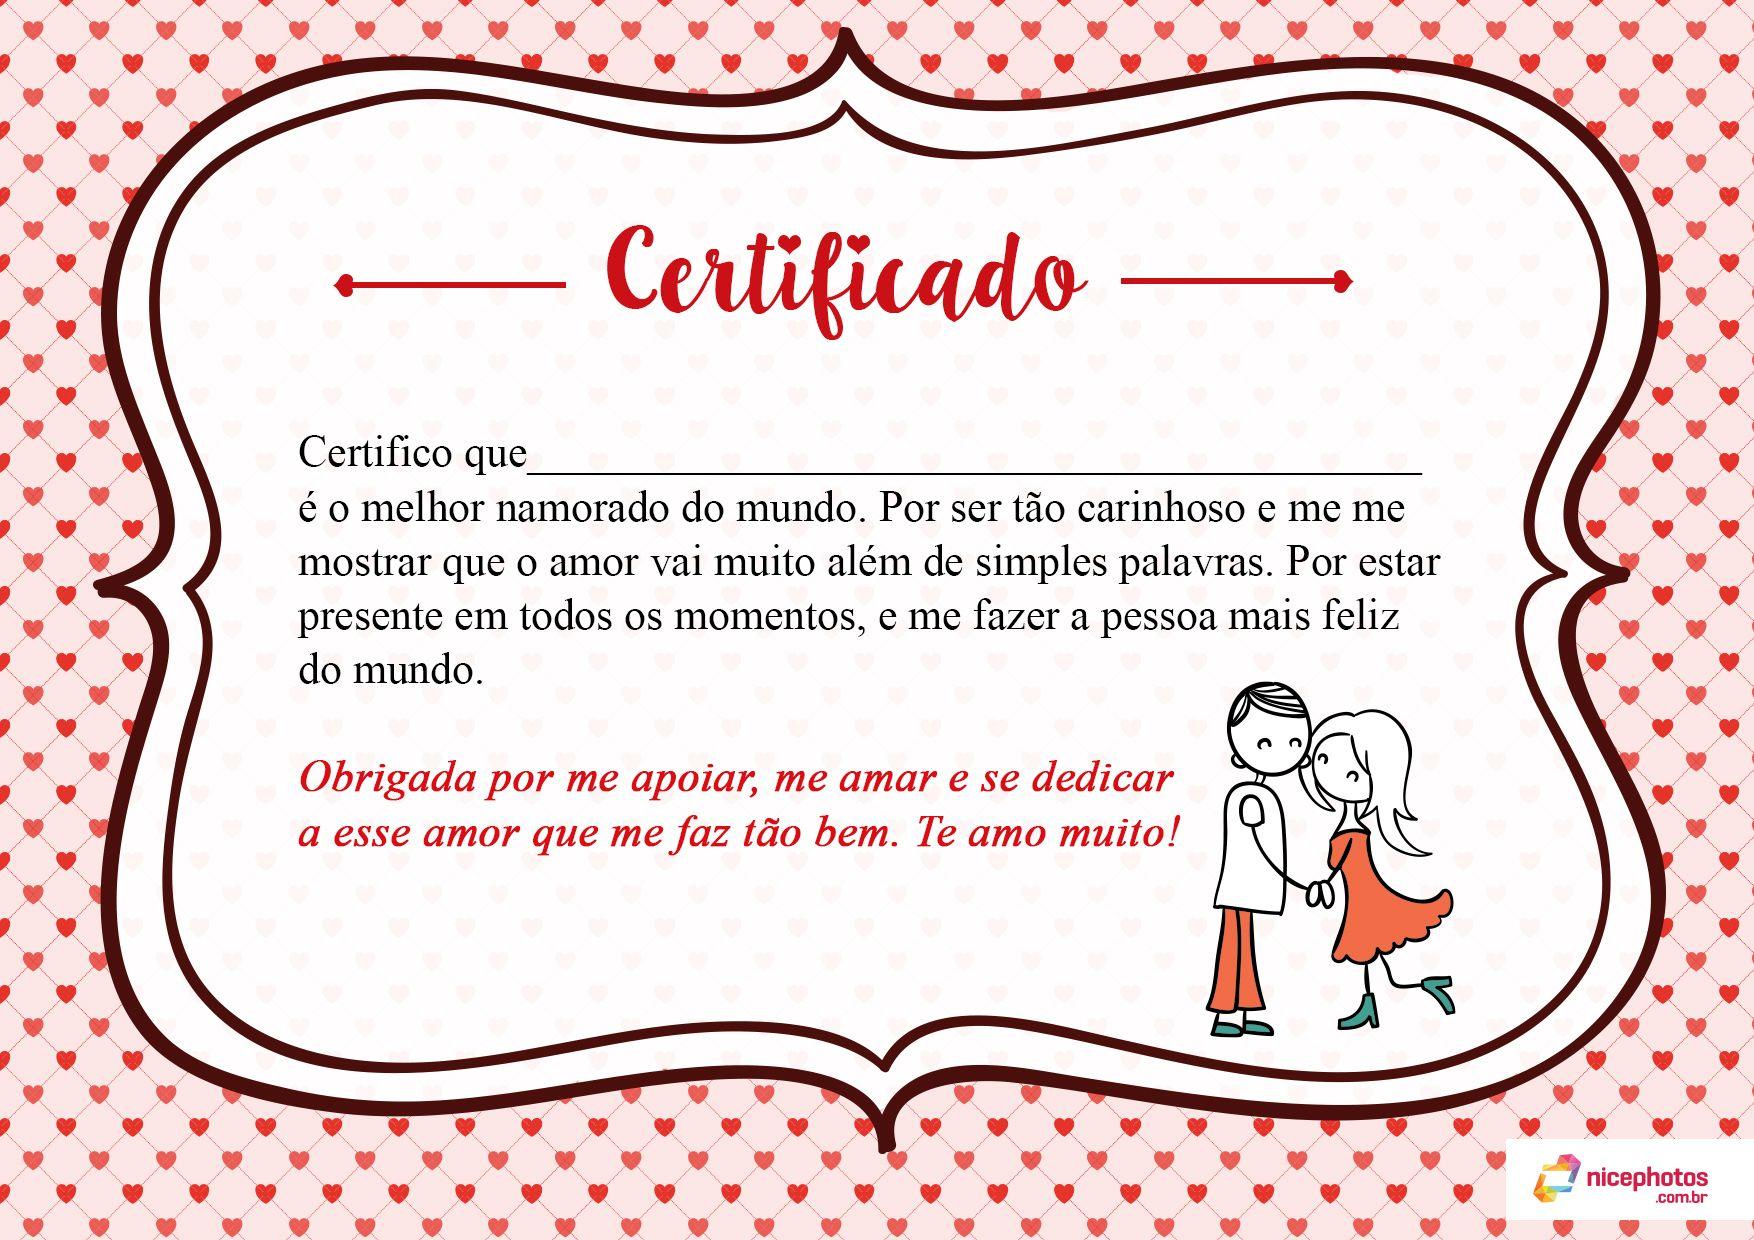 receita do amor para namorado - Pesquisa Google | CRCF | Pinterest